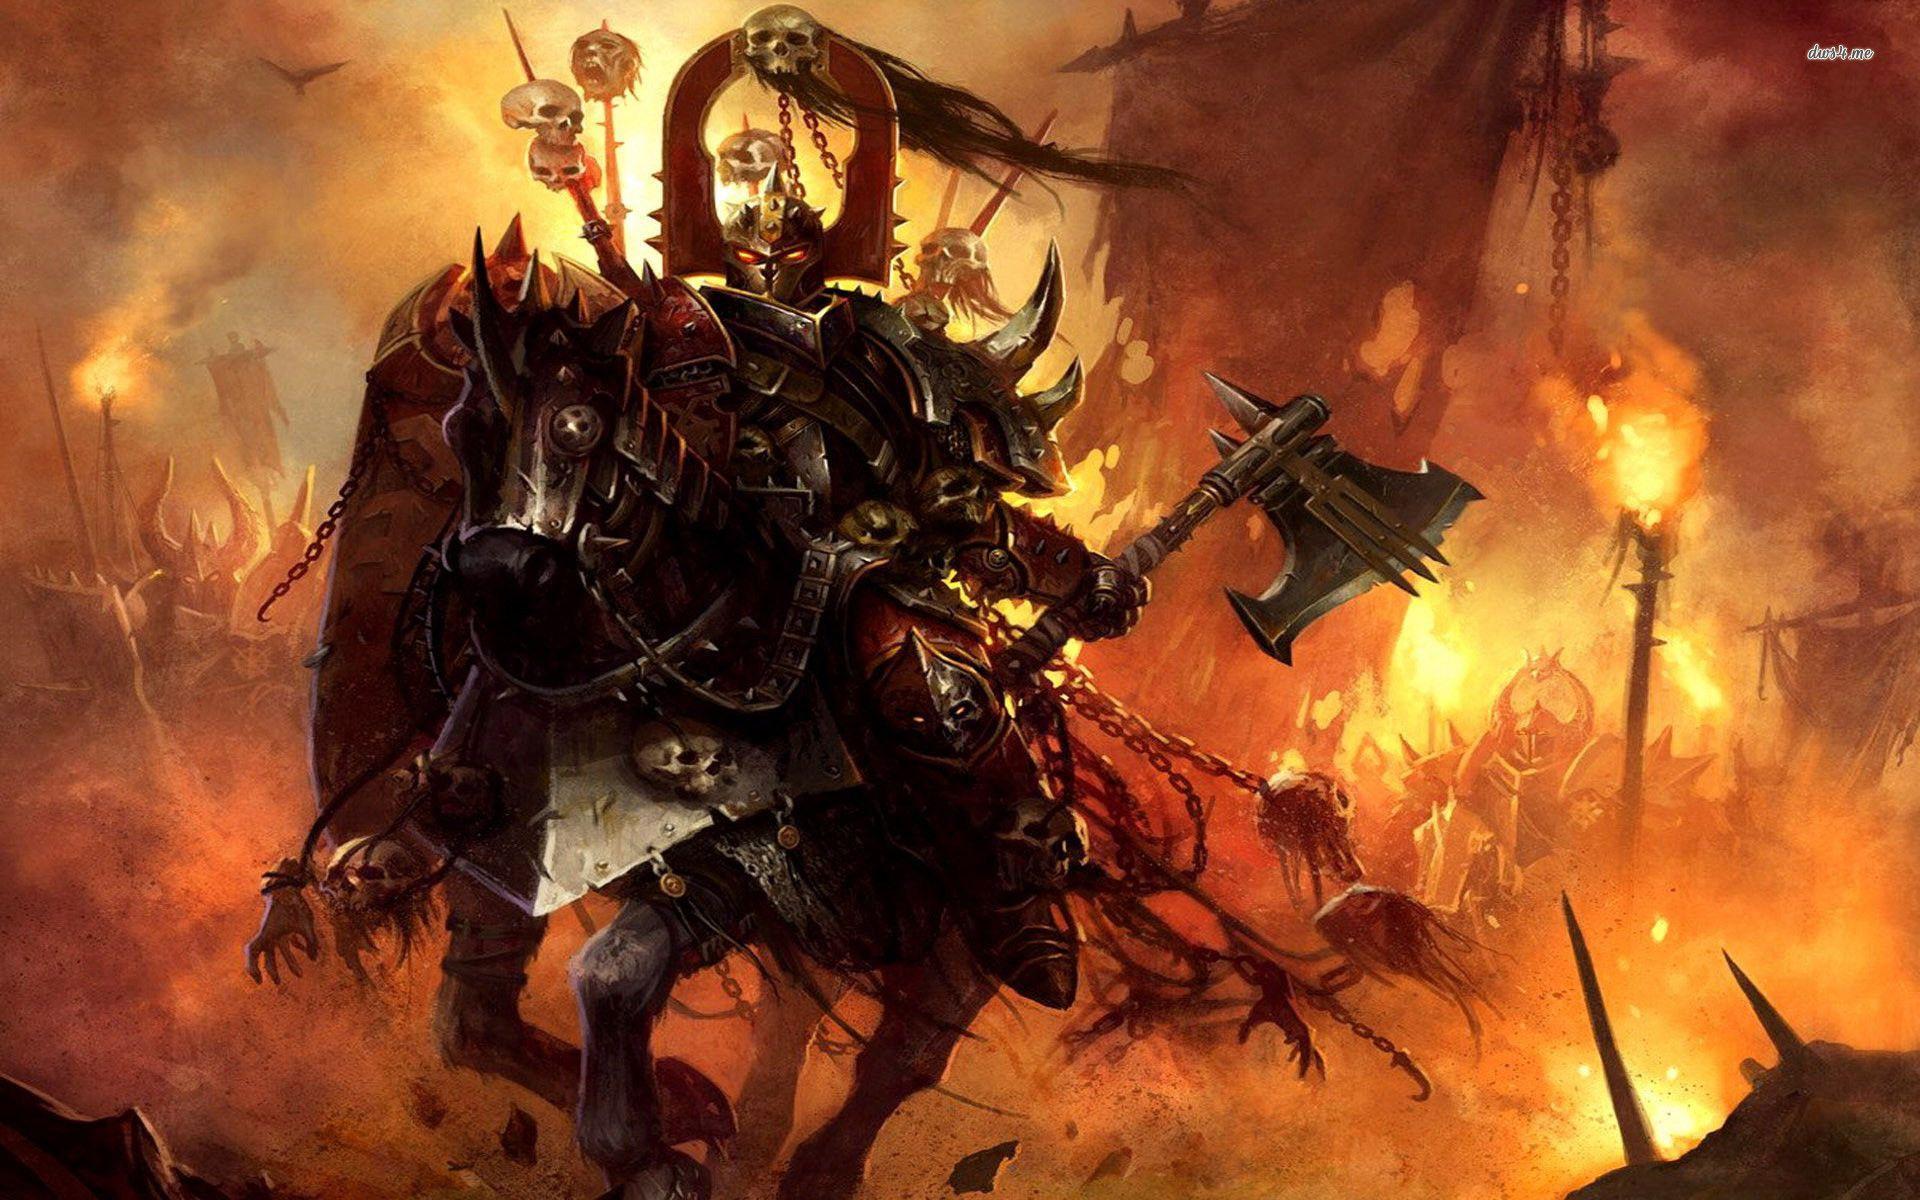 Warhammer Wallpapers - Wallpaper Cave